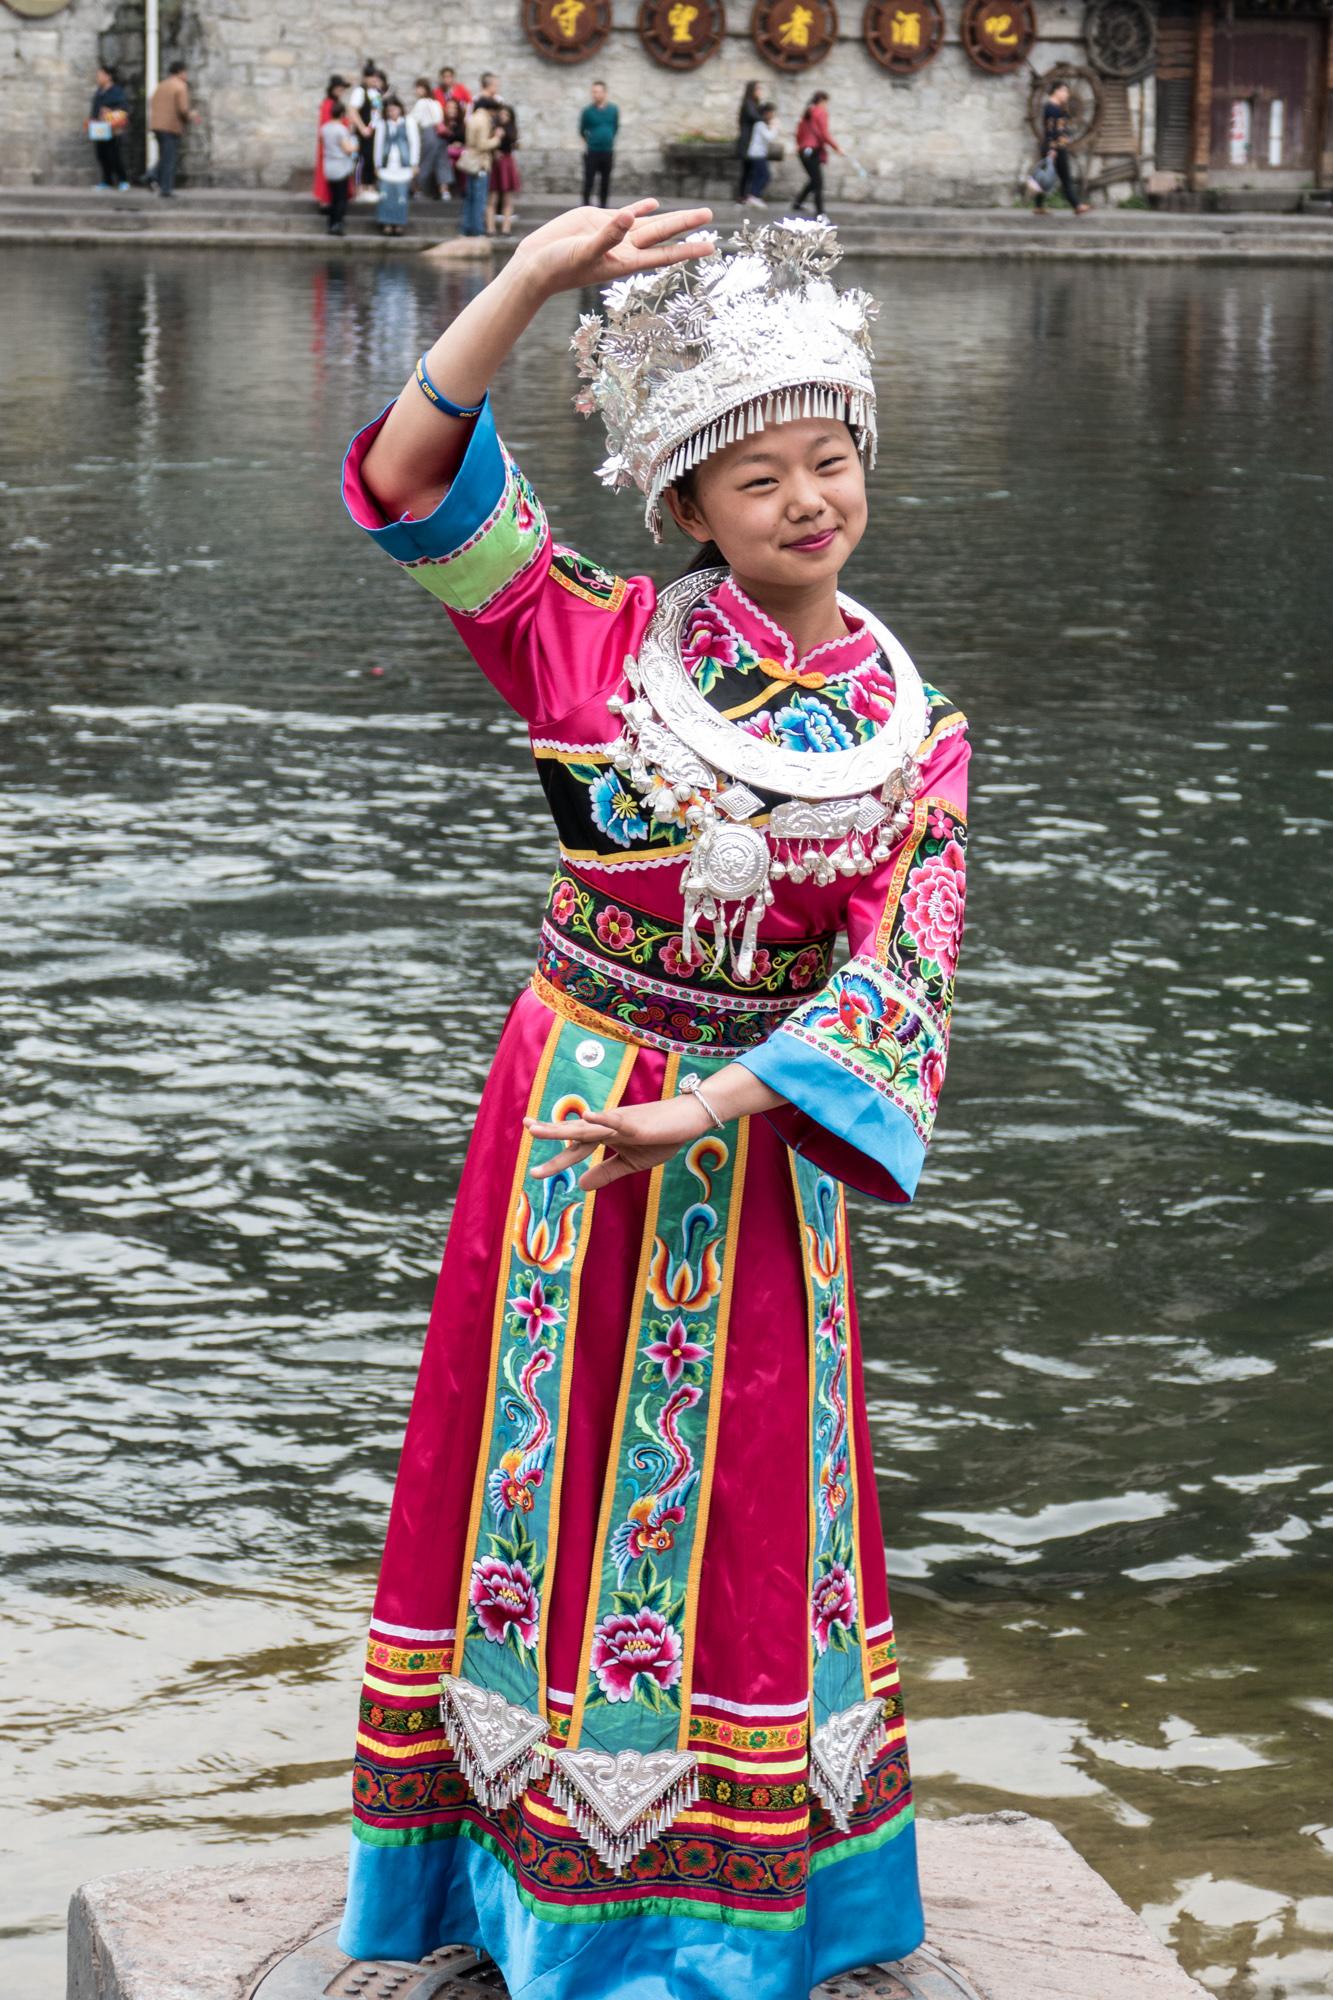 An ethnic minority costume